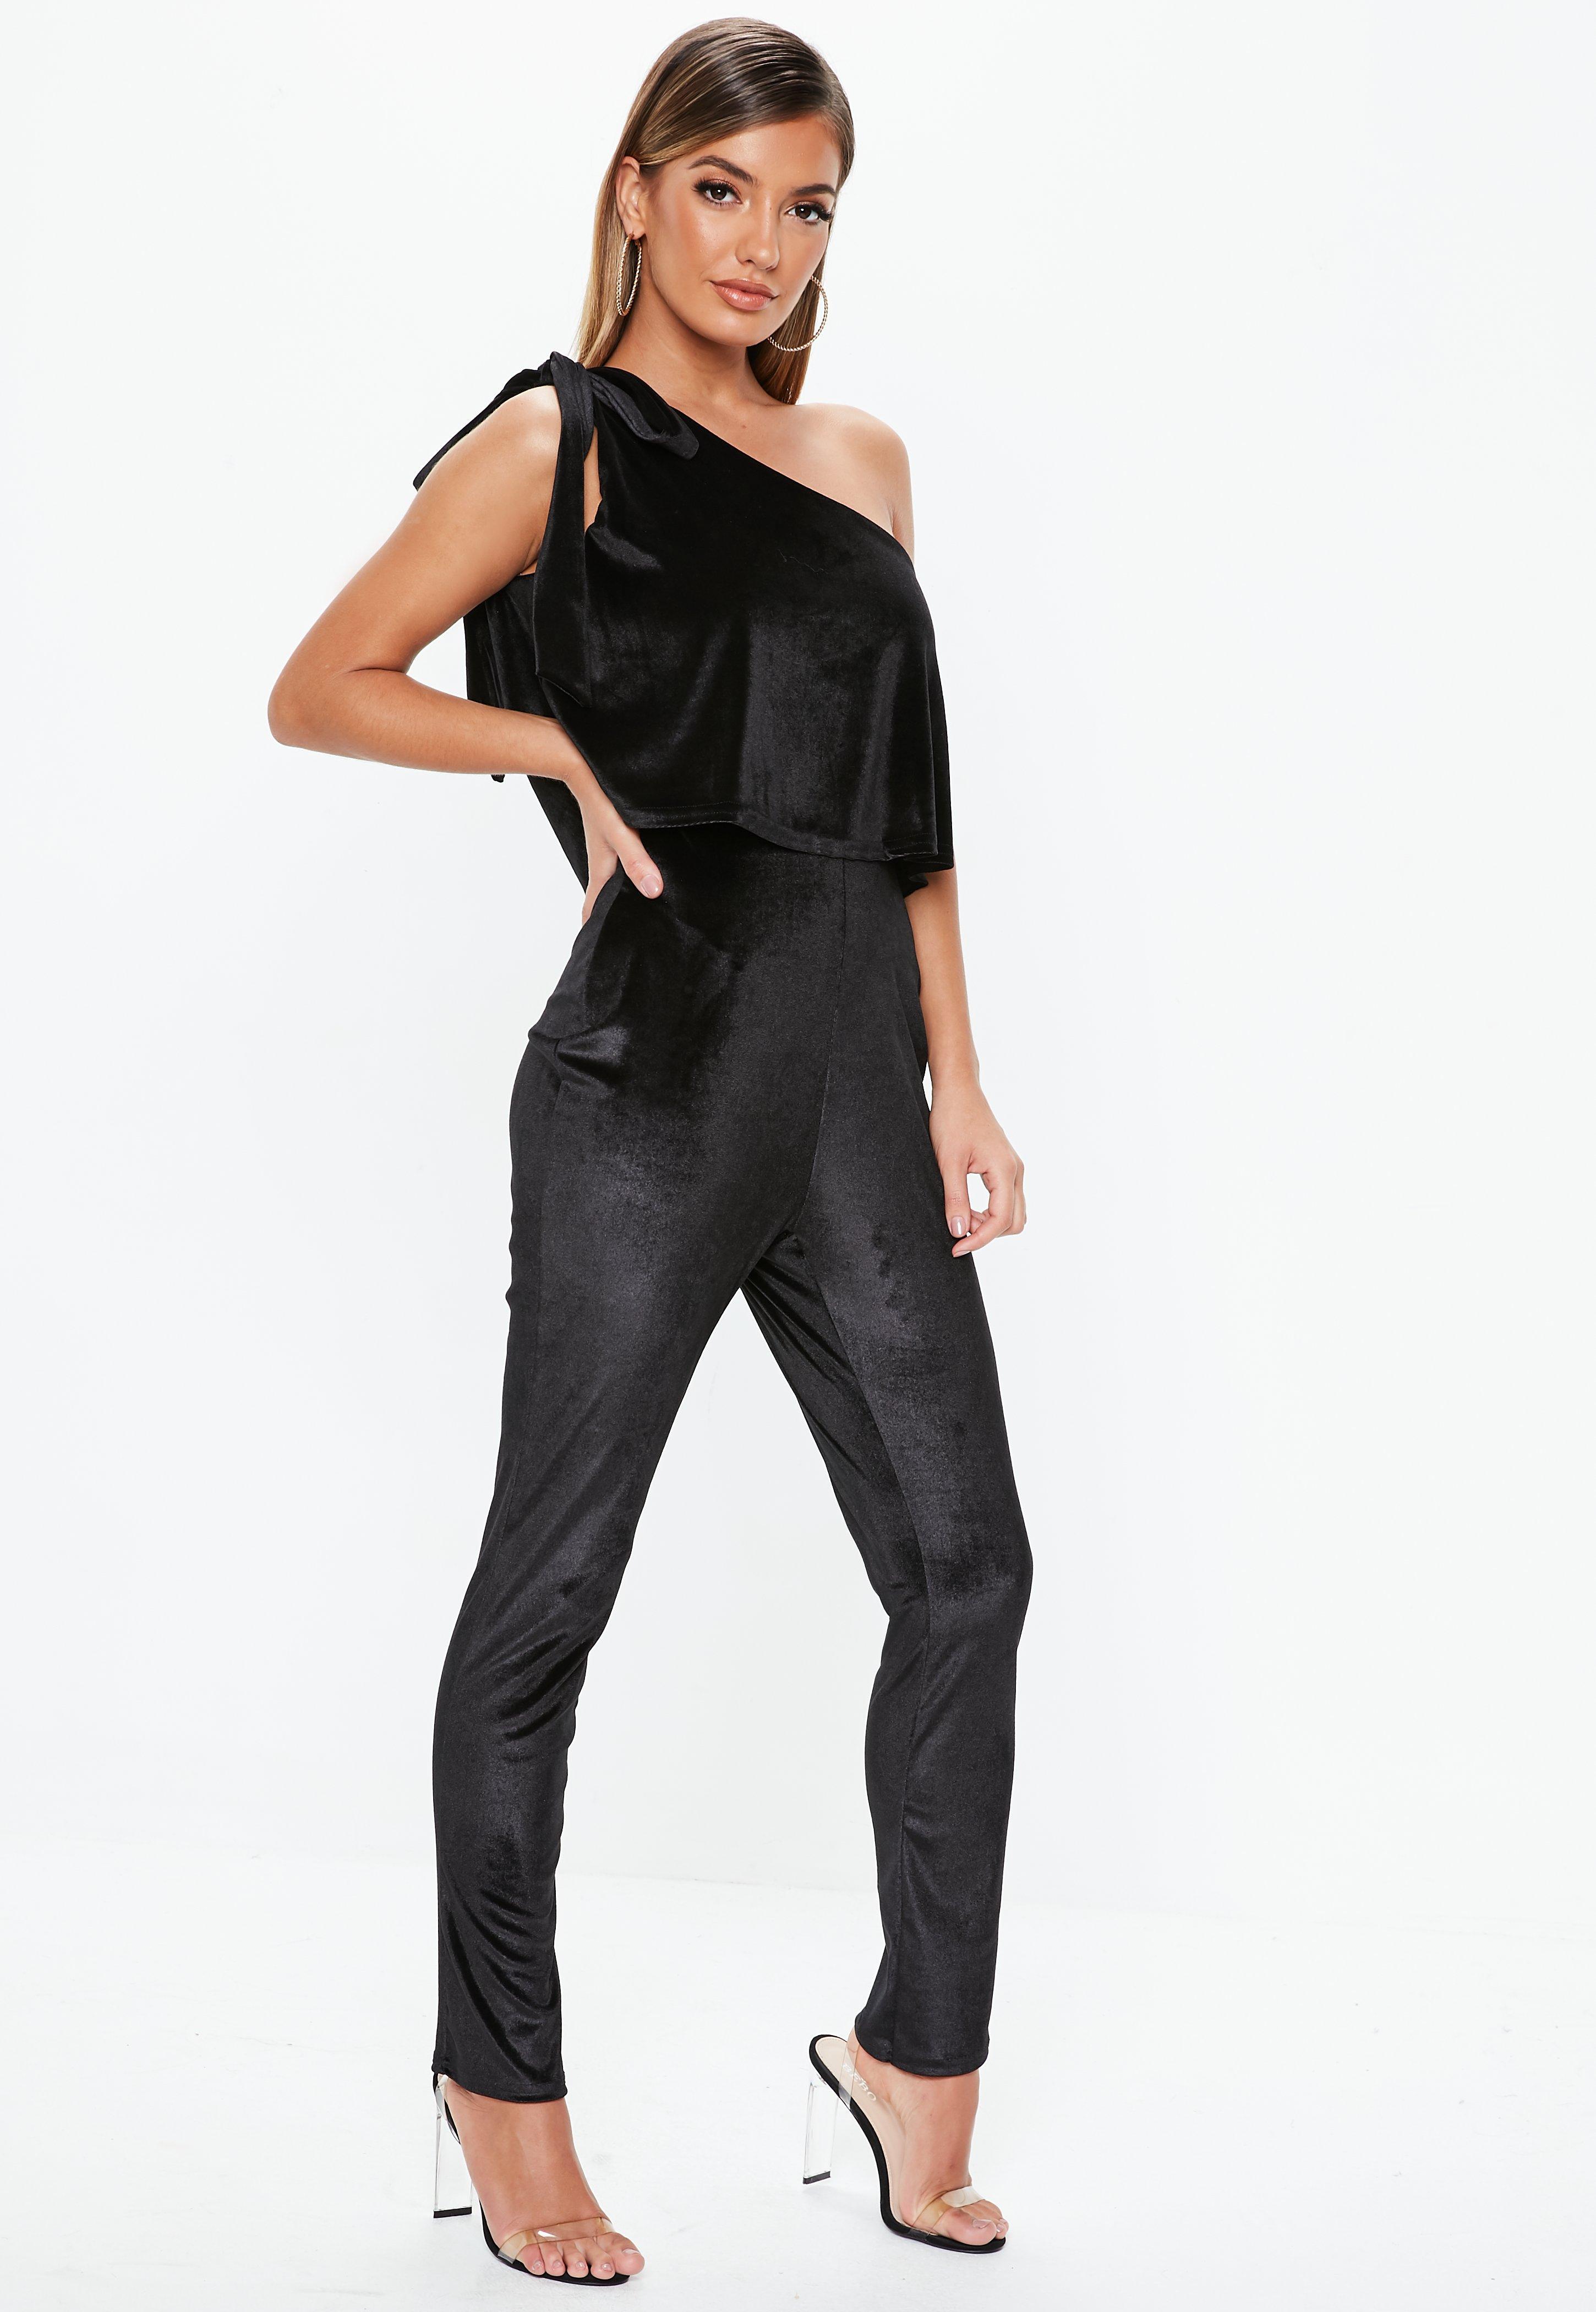 a8b44b24b3 Black Velvet One Shoulder Bow Jumpsuit